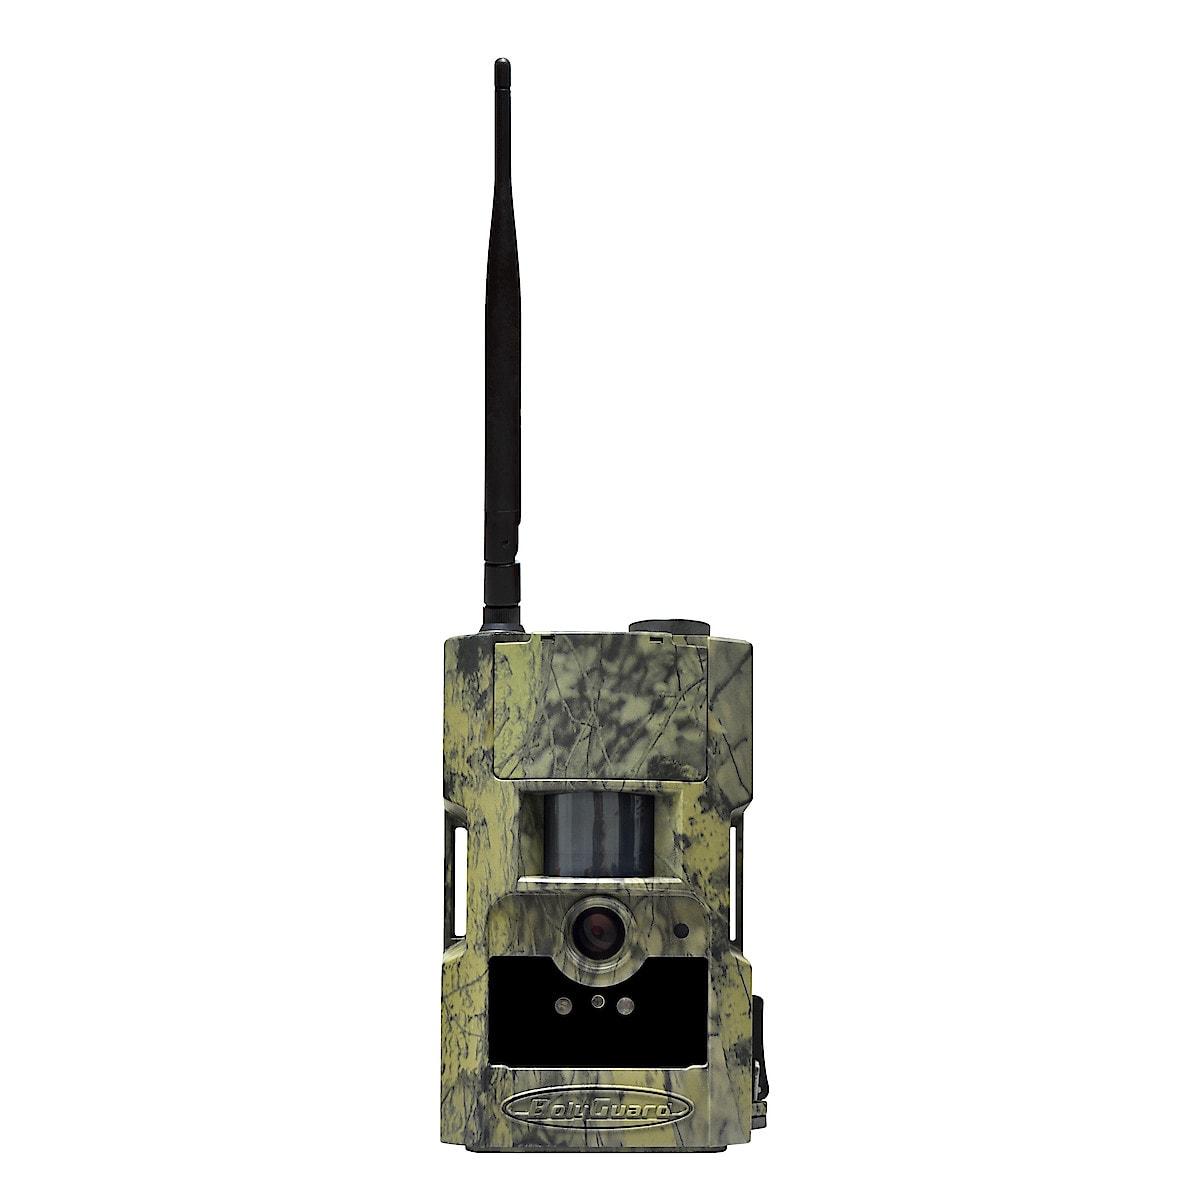 Valvonta- ja riistakamera MMS/GPRS, MG882K-12mHD